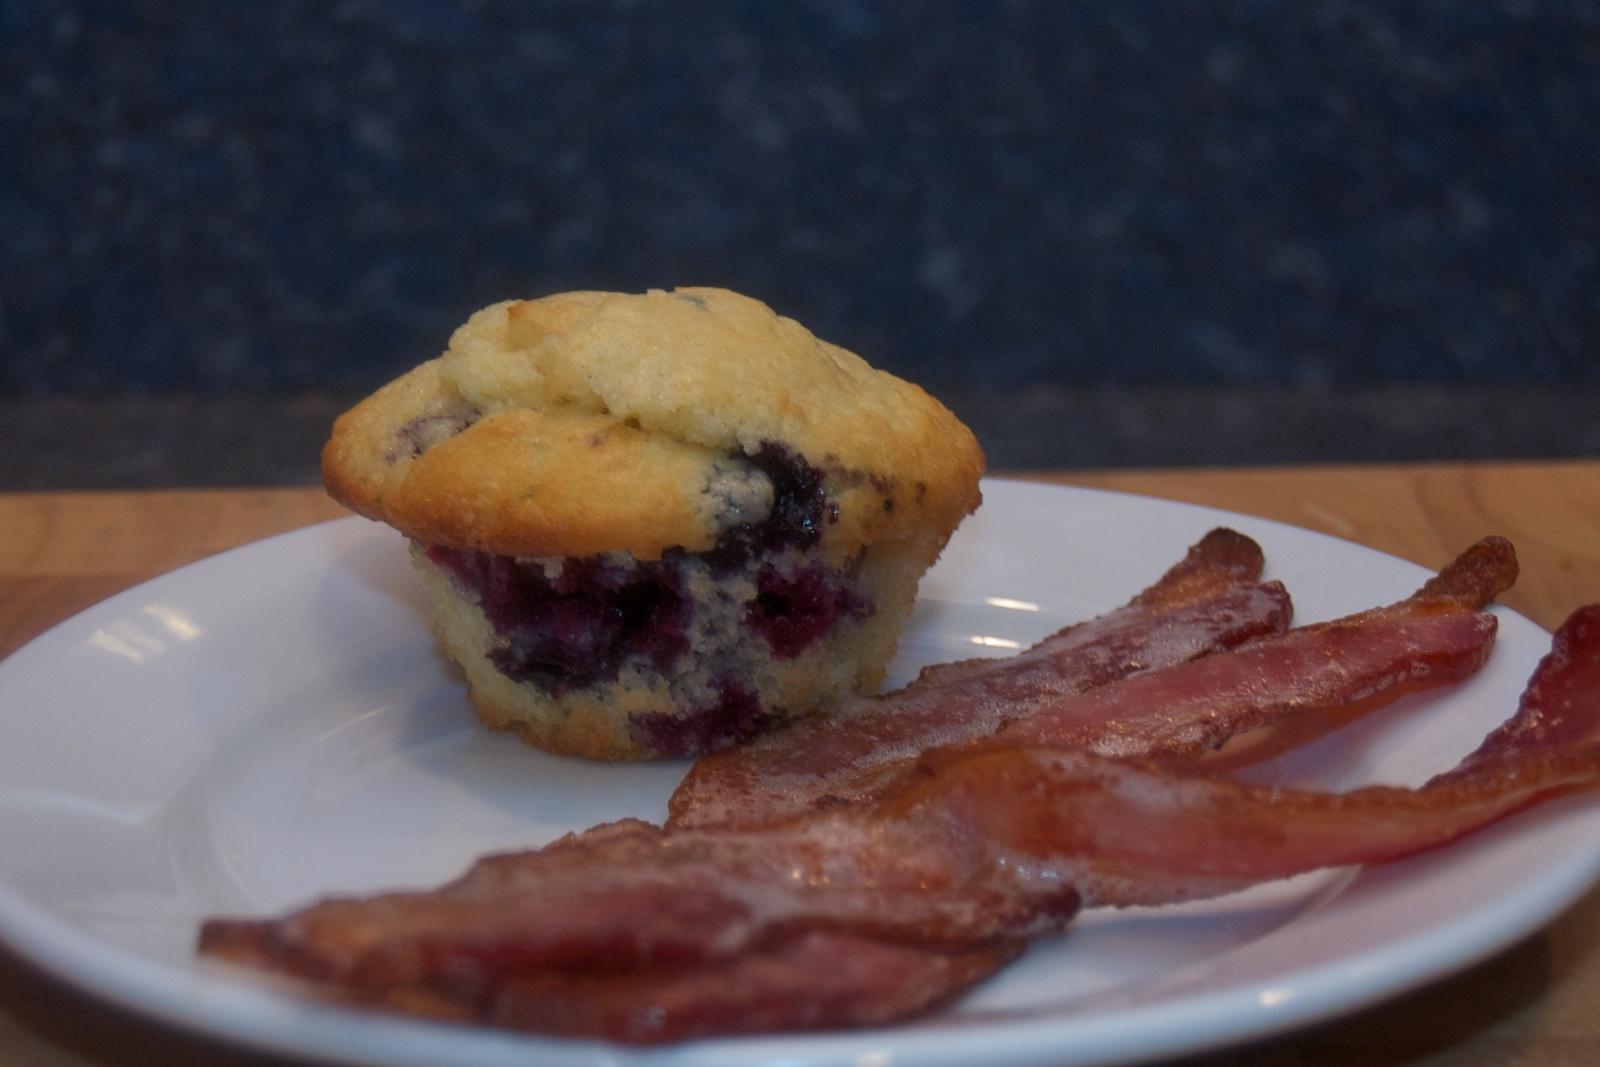 http://blog.rickk.com/food/2011/10/27/ate.2011.10.27.b.jpg